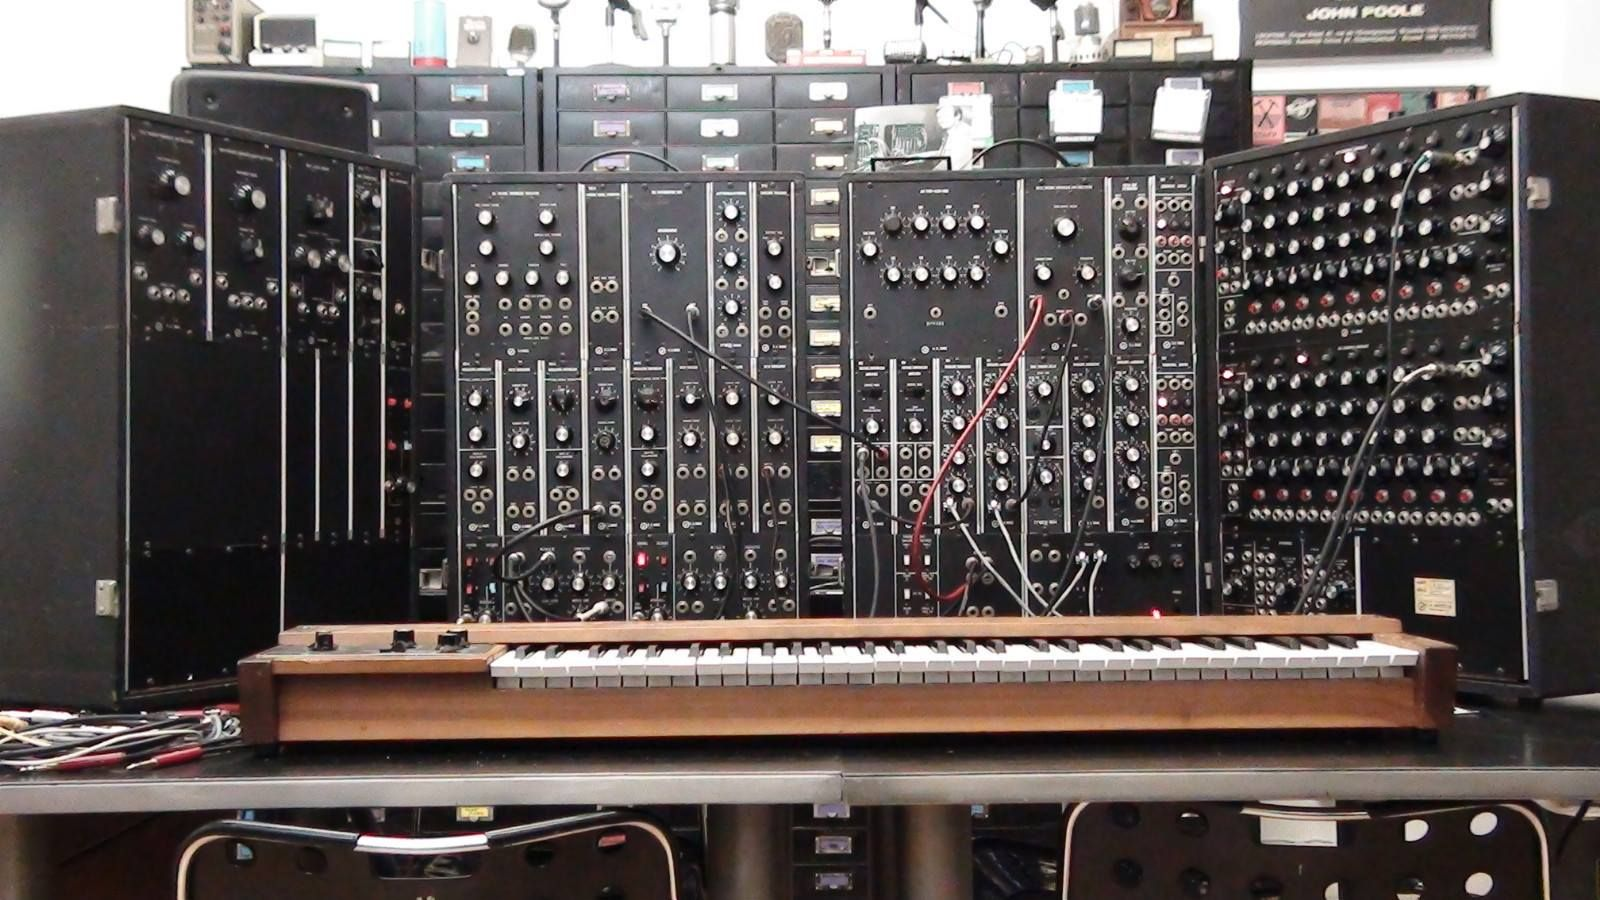 control voltage keyboard modular synthesizer synths and vintage keyboards moog synthesizer. Black Bedroom Furniture Sets. Home Design Ideas